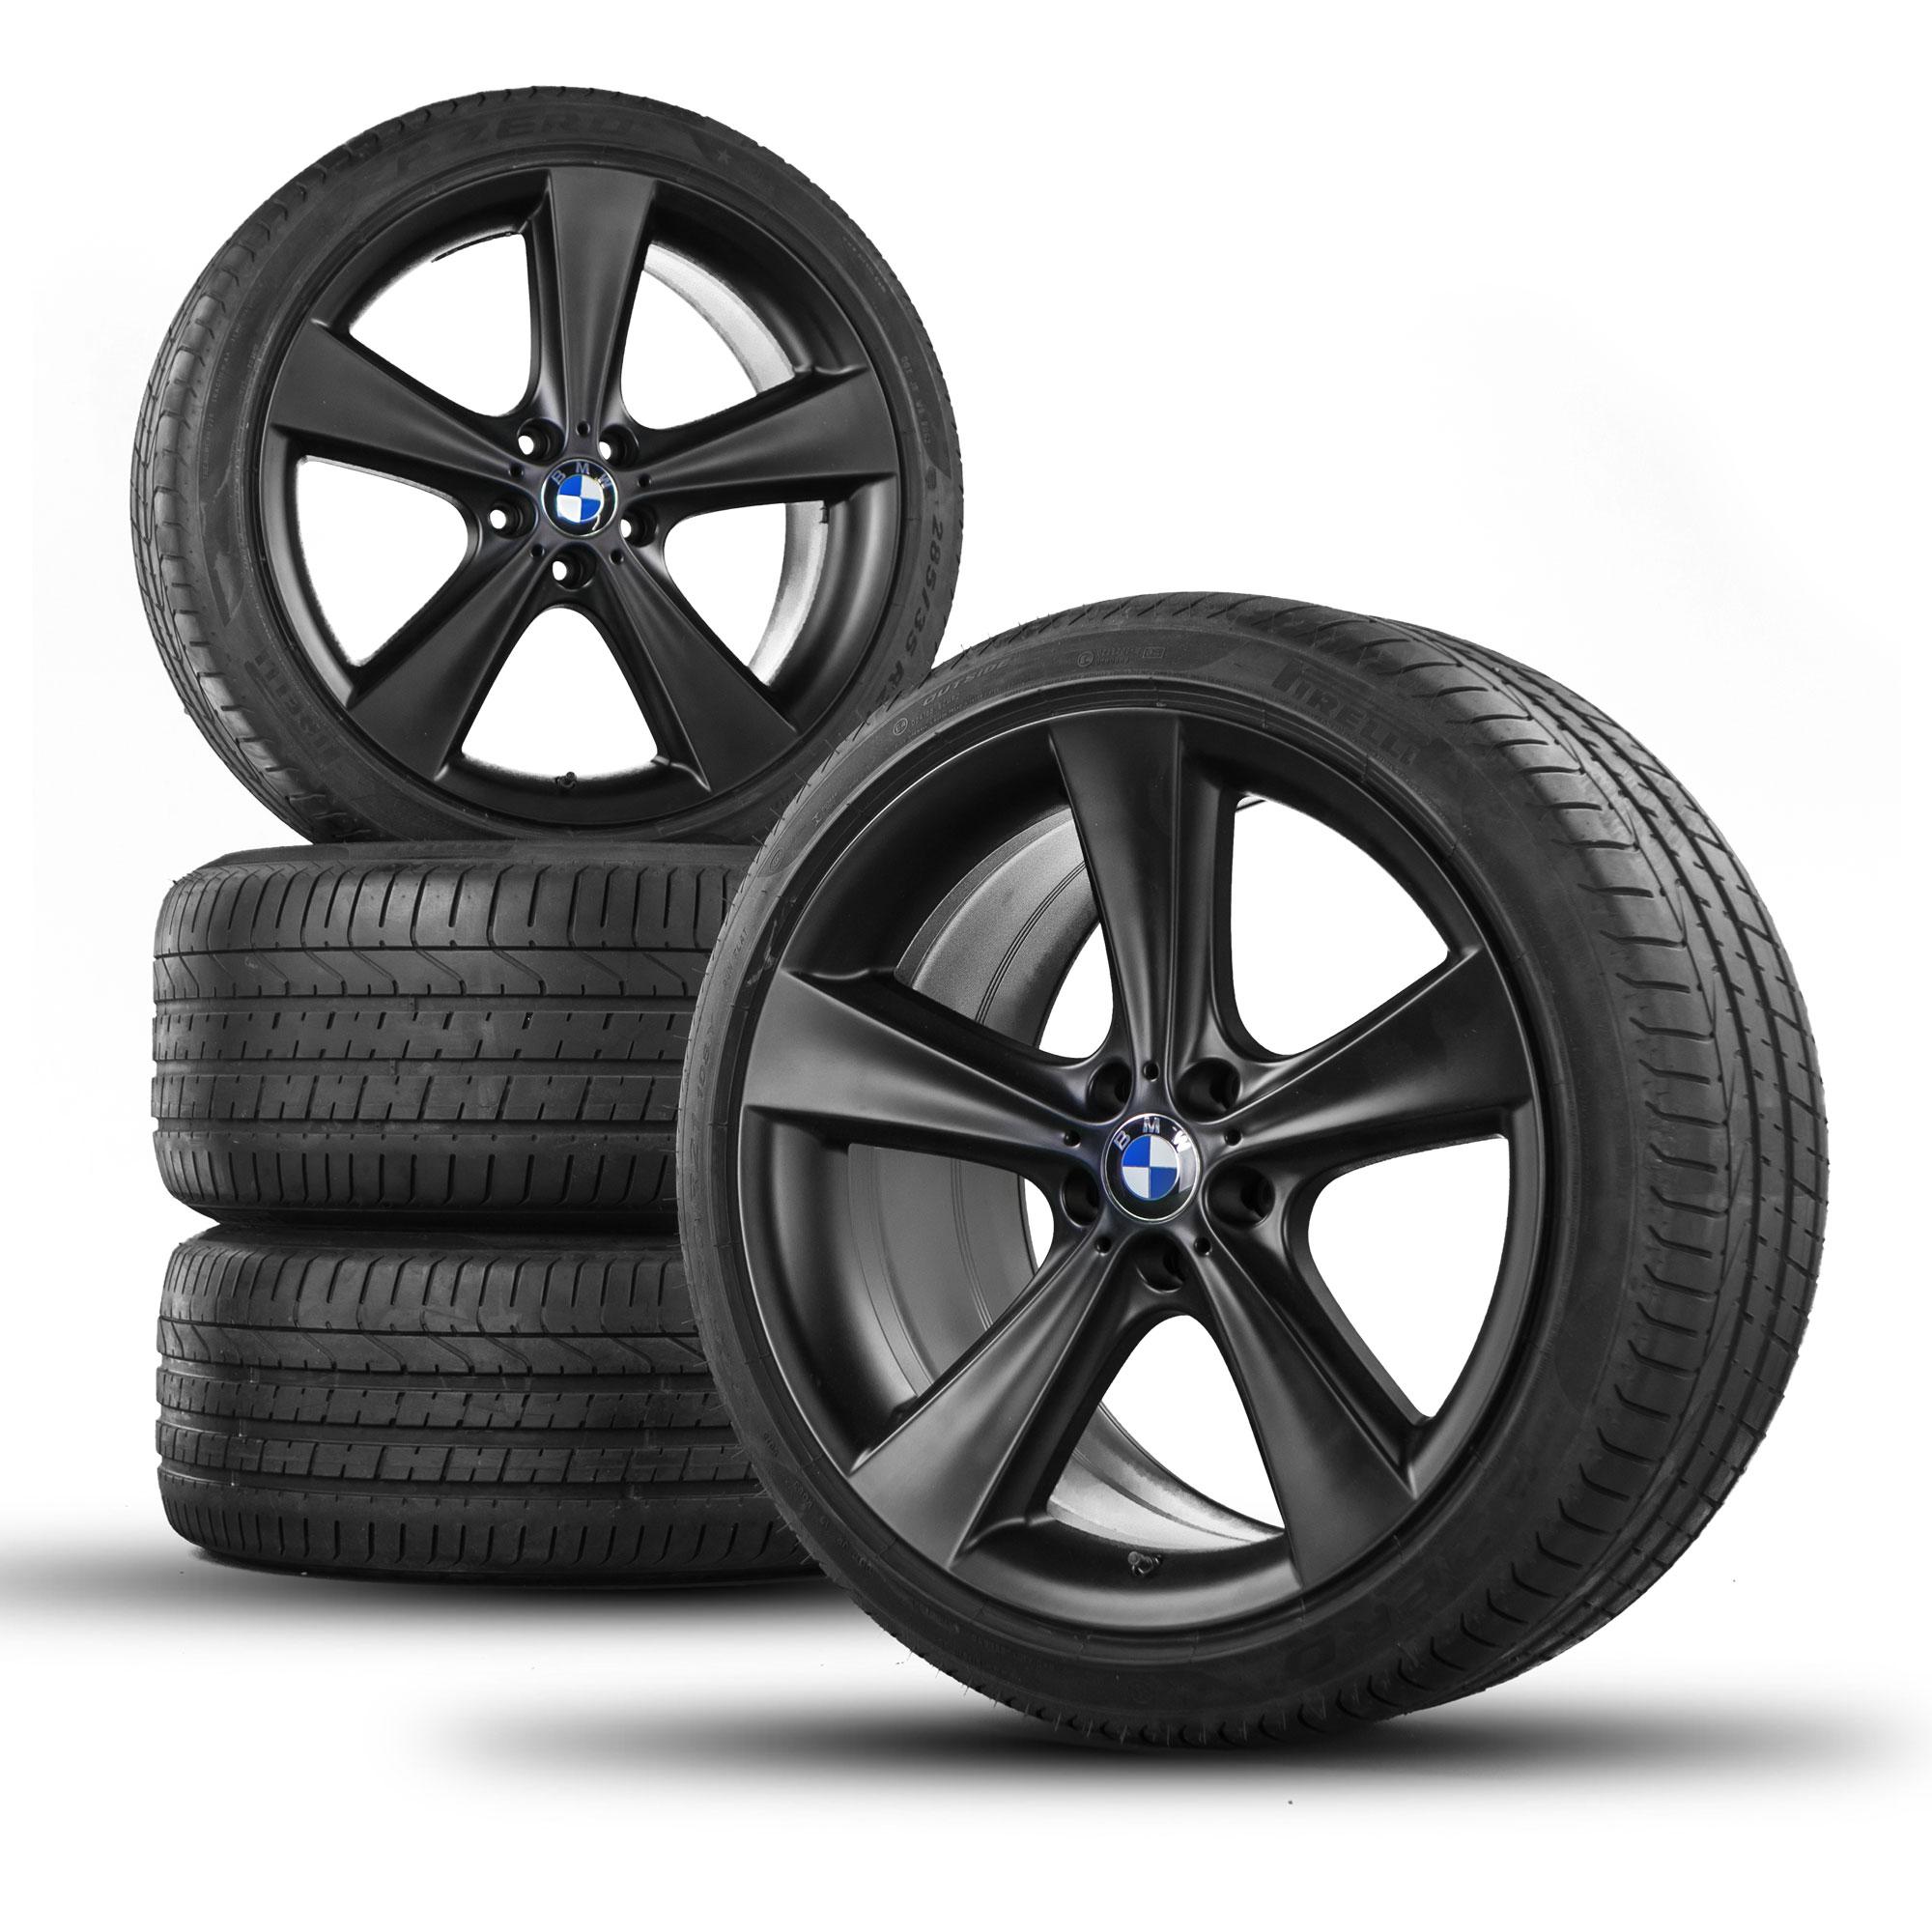 Original Bmw 21 Inch Rims X5 F15 X6 E71 F16 Alloy Wheels